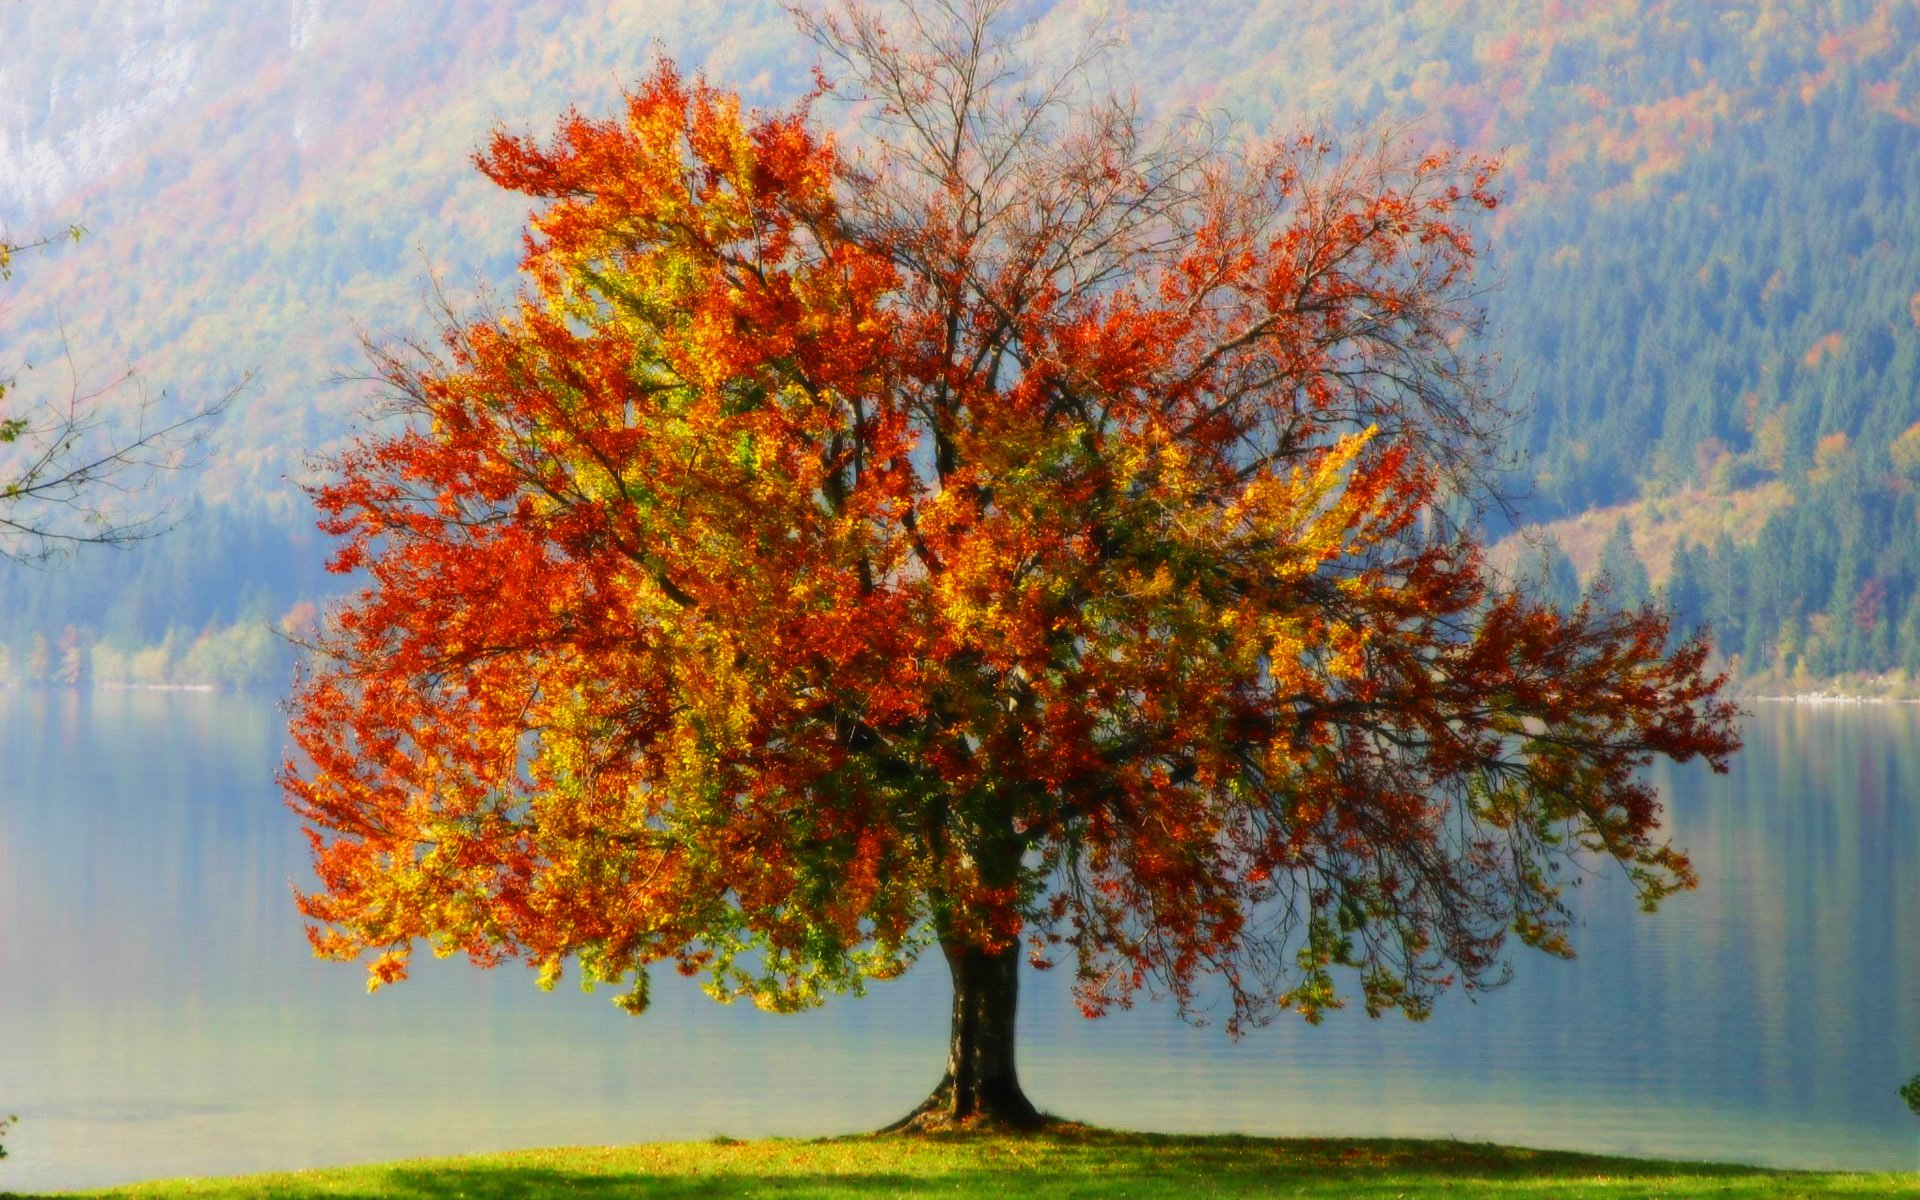 Autumn tree wallpaper wallpapersafari for Arboles de jardin de hoja caduca